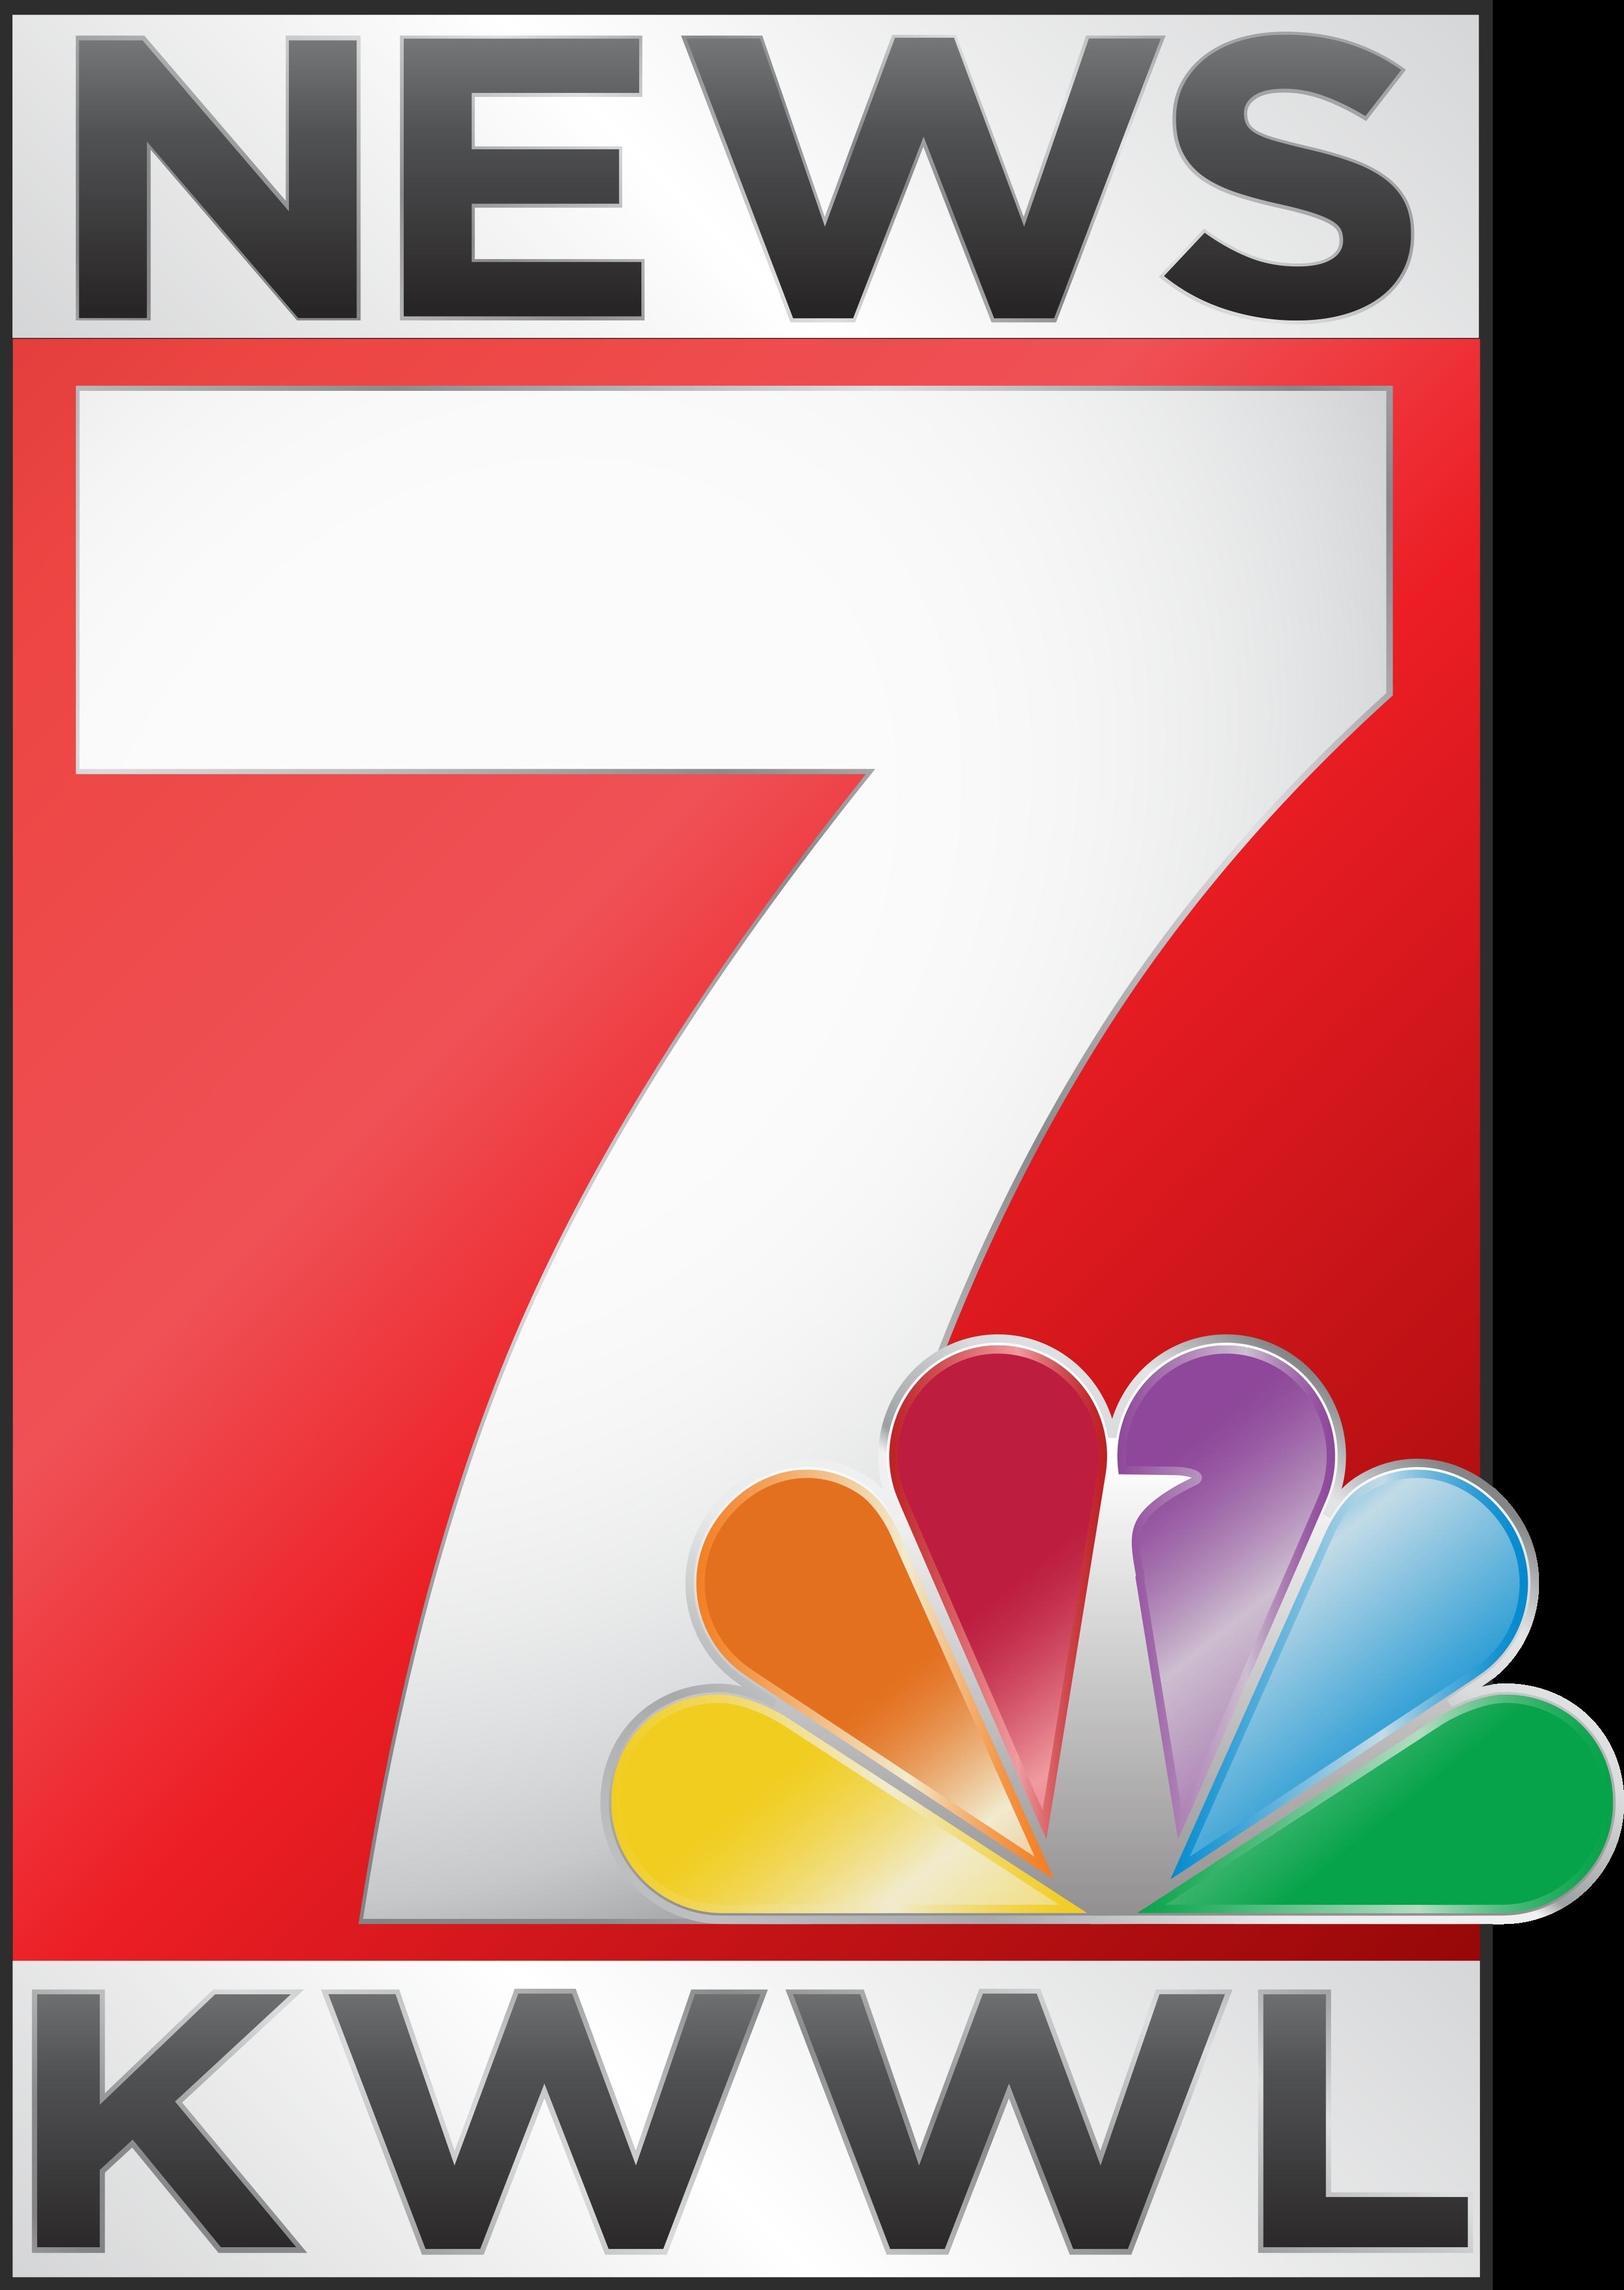 KWWL Television, Inc.